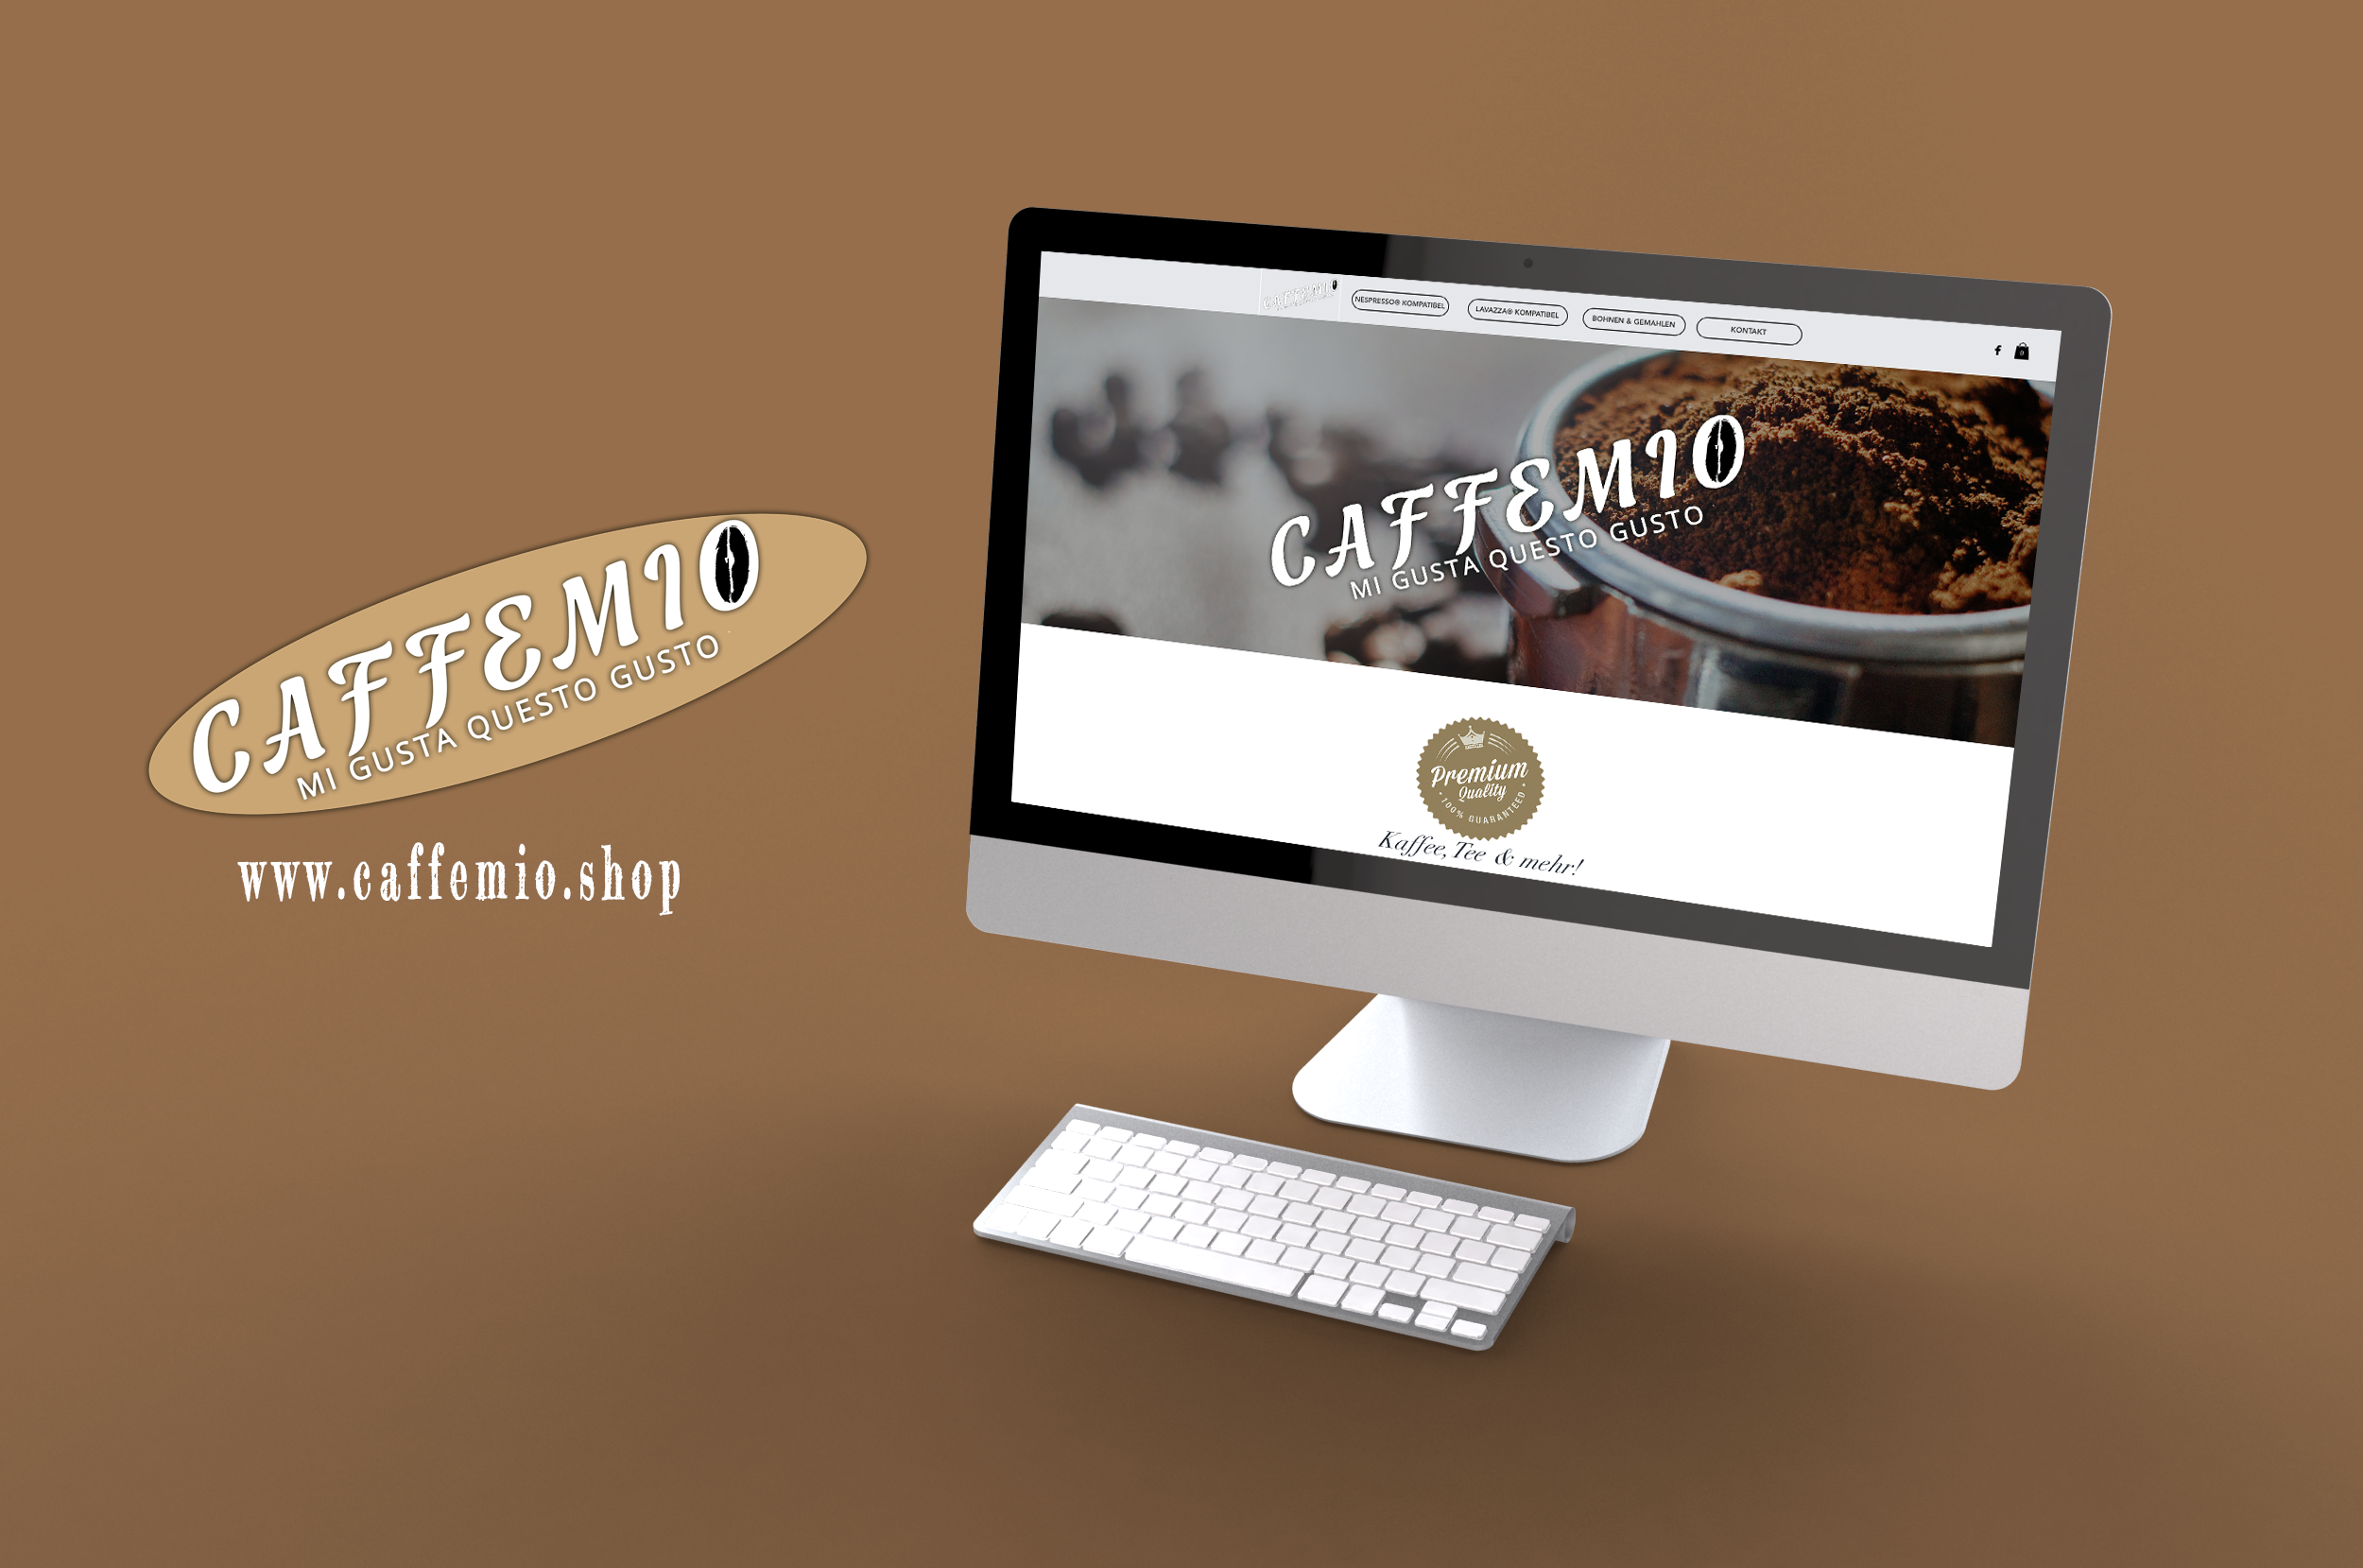 Caffemio